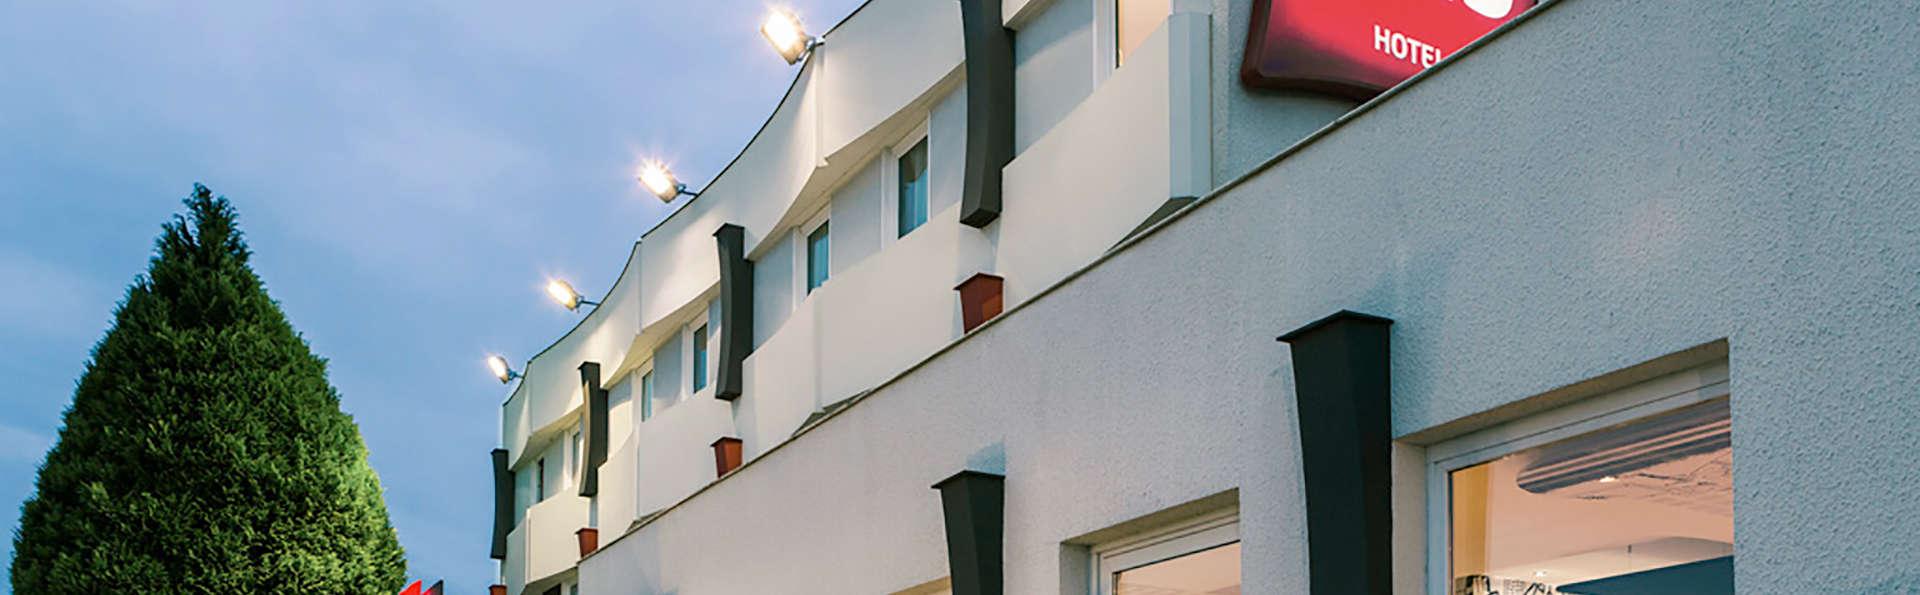 Hôtel Ibis Limoges Nord - Edit_Front2.jpg